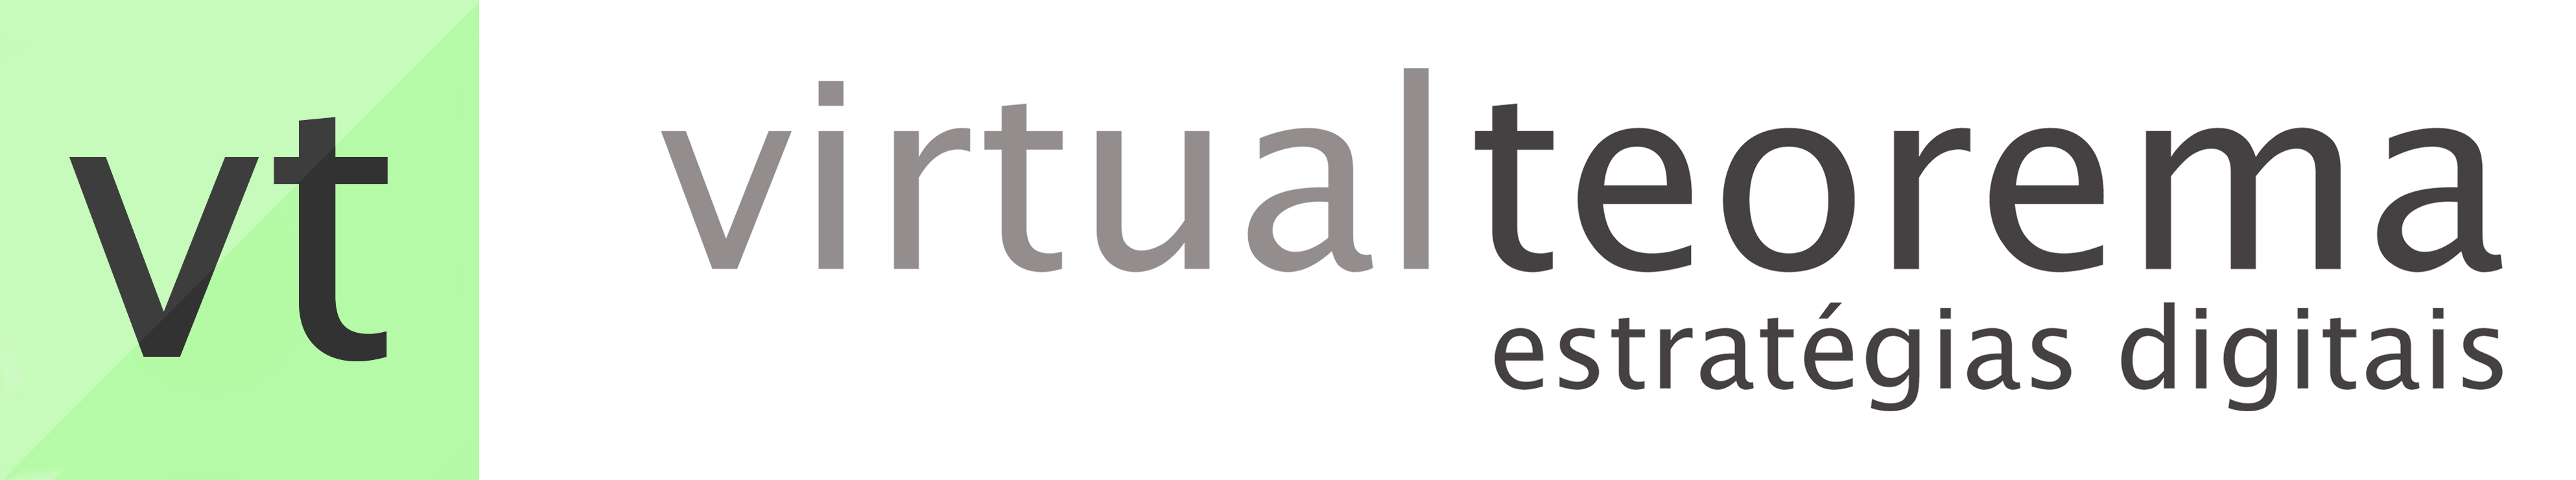 Virtualteorema